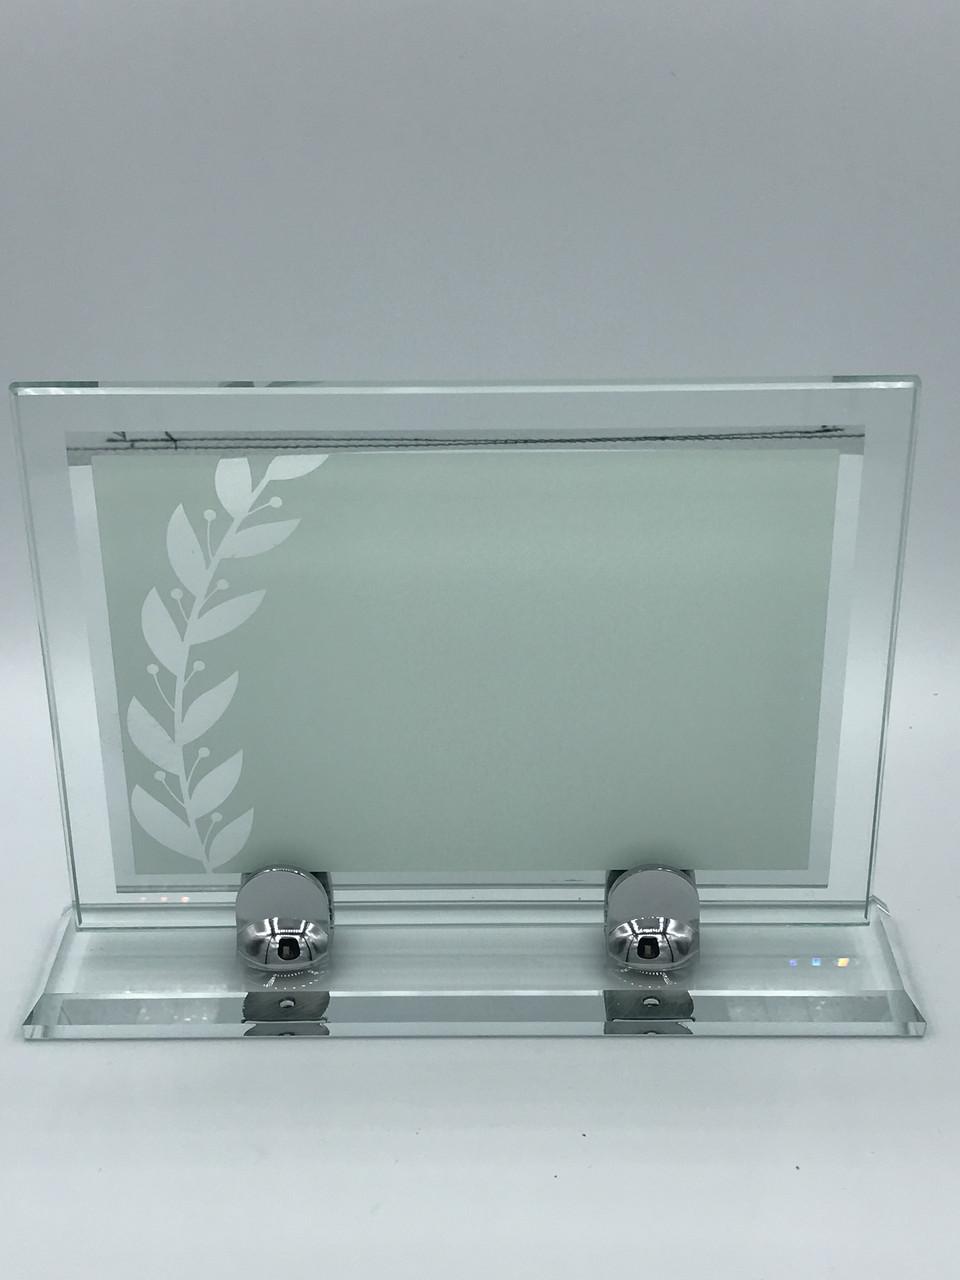 Награда стеклянная для сублимации (14.5х20см)